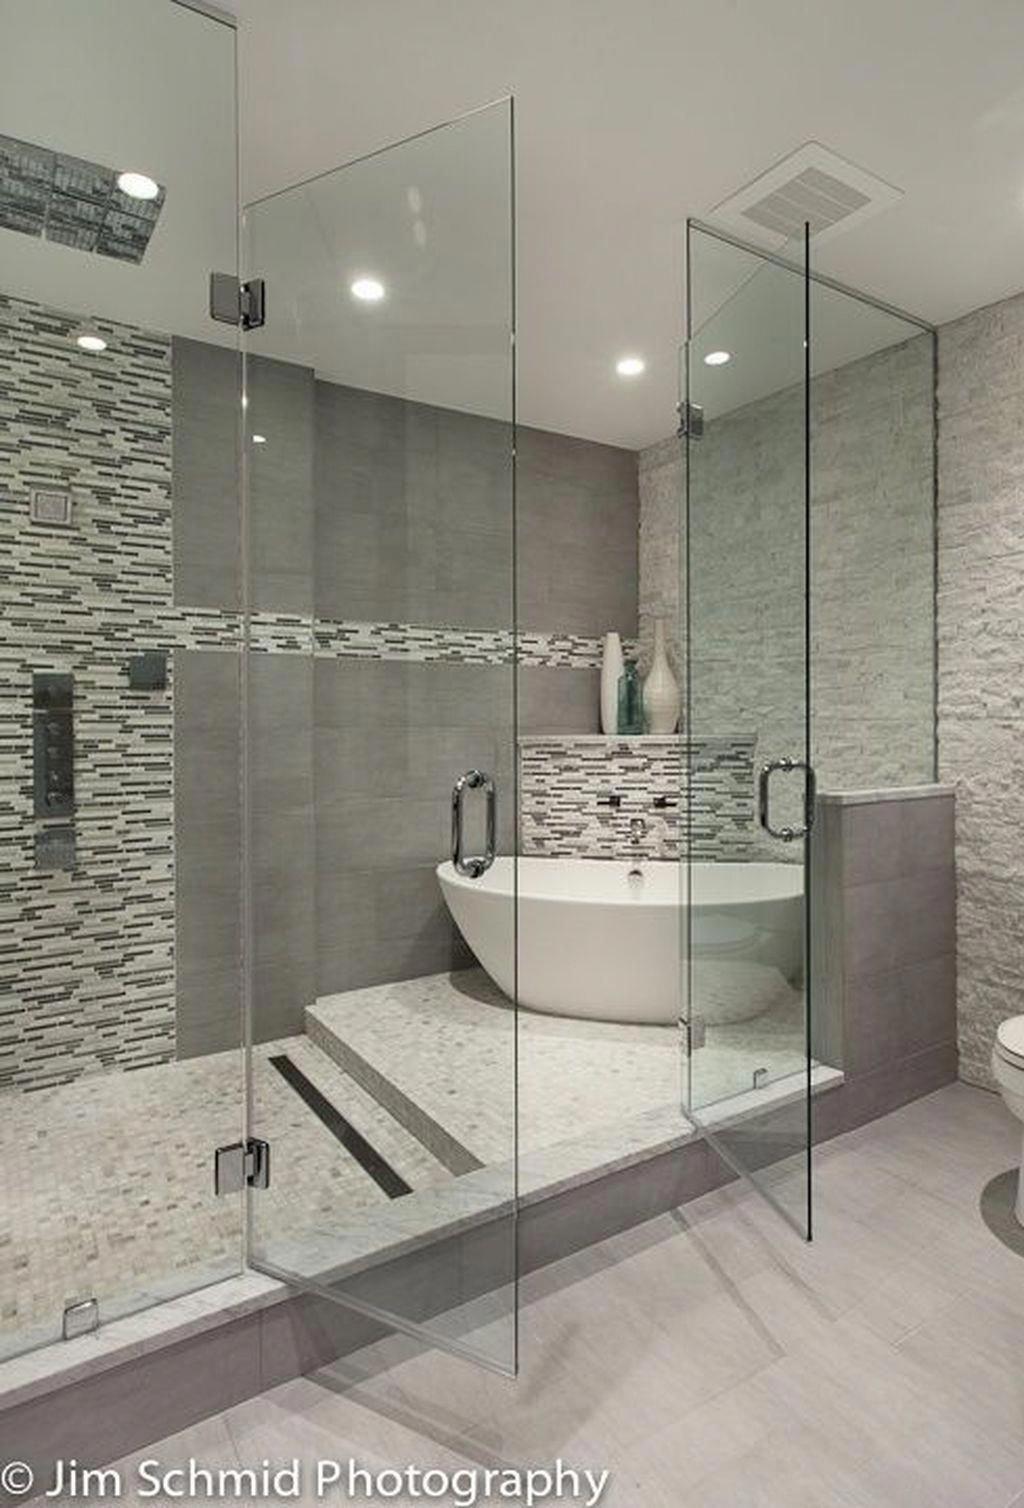 Stunning 30 Best Master Bathroom Shower Remodel Ideas To Try Bathroom Ideas Bathroom In 2020 Bathroom Remodel Shower Master Bathroom Design Bathroom Remodel Master